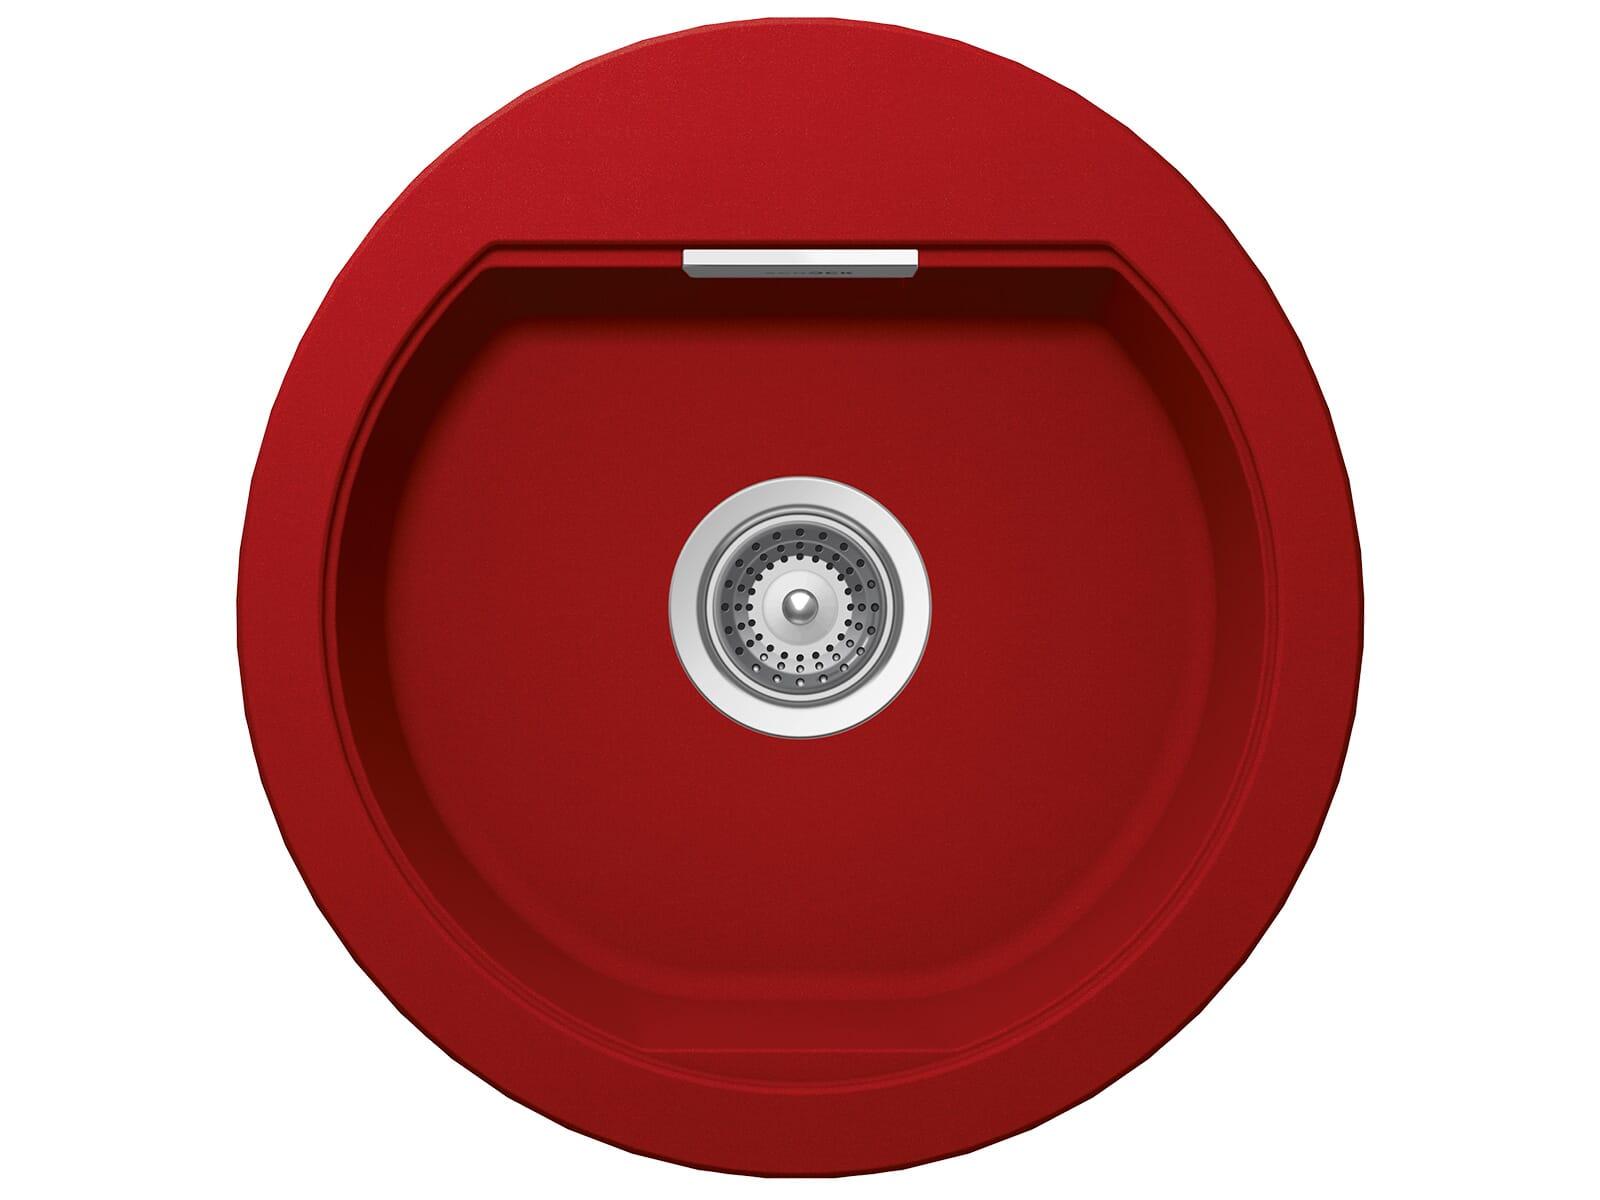 Schock Mono R-100 A Rouge - MONR100AROU Granitspüle